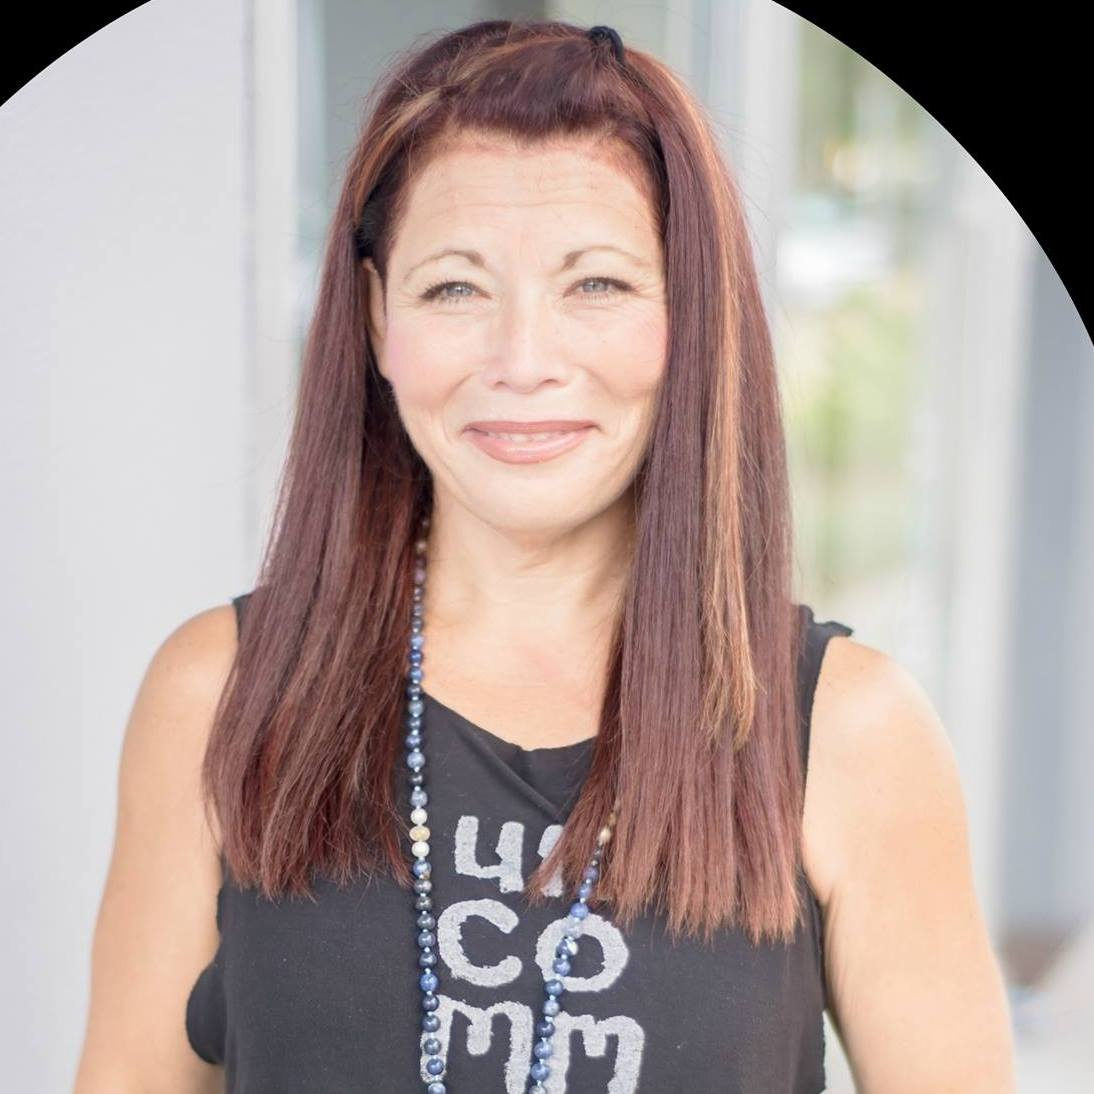 Felicia McQuaid-Reiki Master, Yoga Instructor and Medical Intuitive